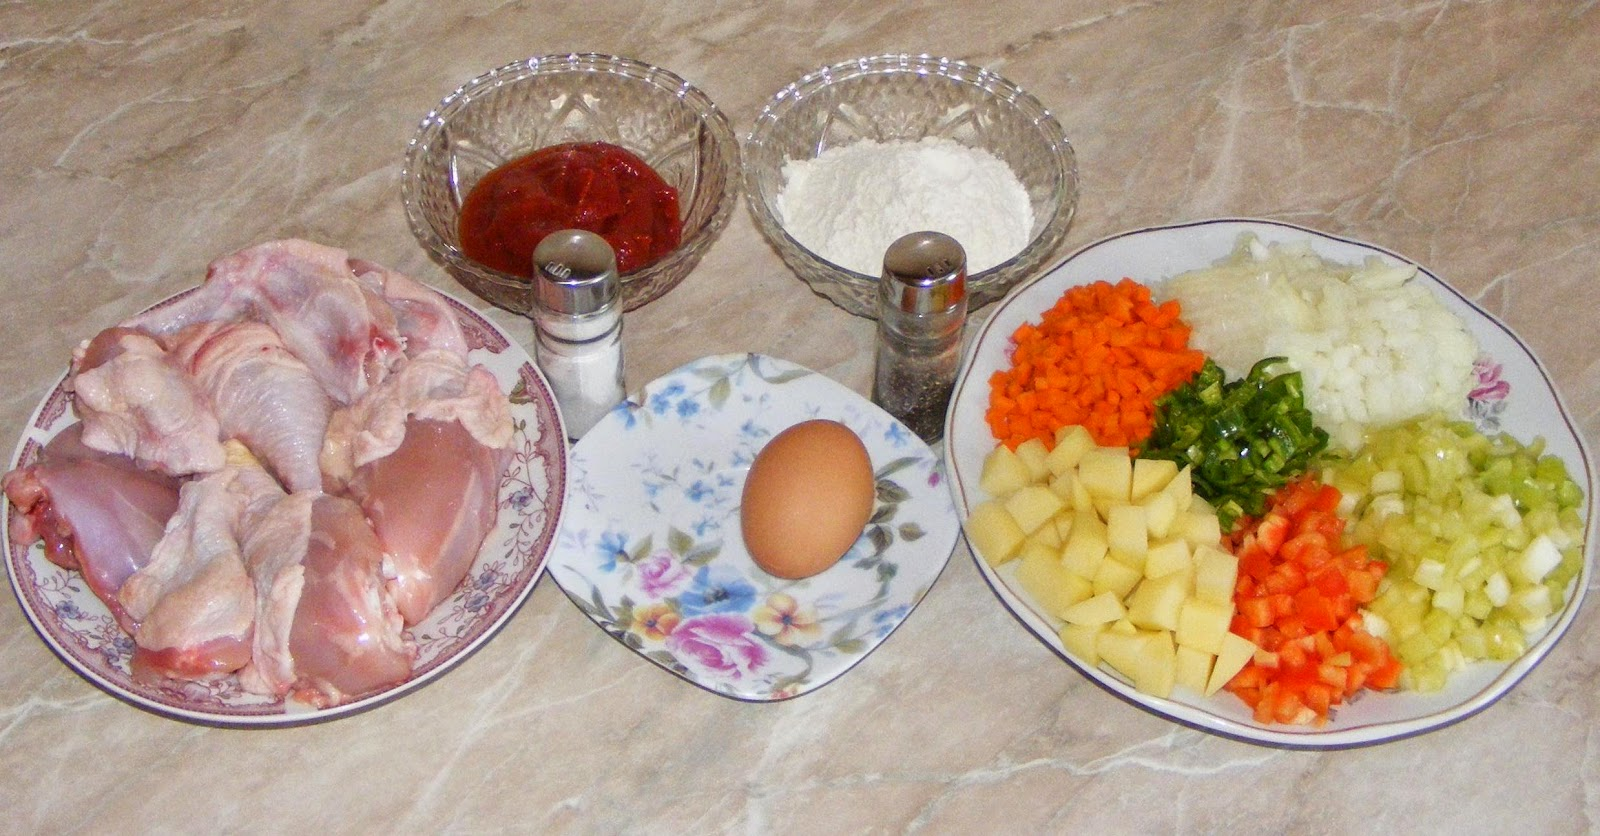 ingrediente gulas, ingrediente papricas, cum se prepara gulas, cum se prepara papricas, cum facem papricas sau gulas,